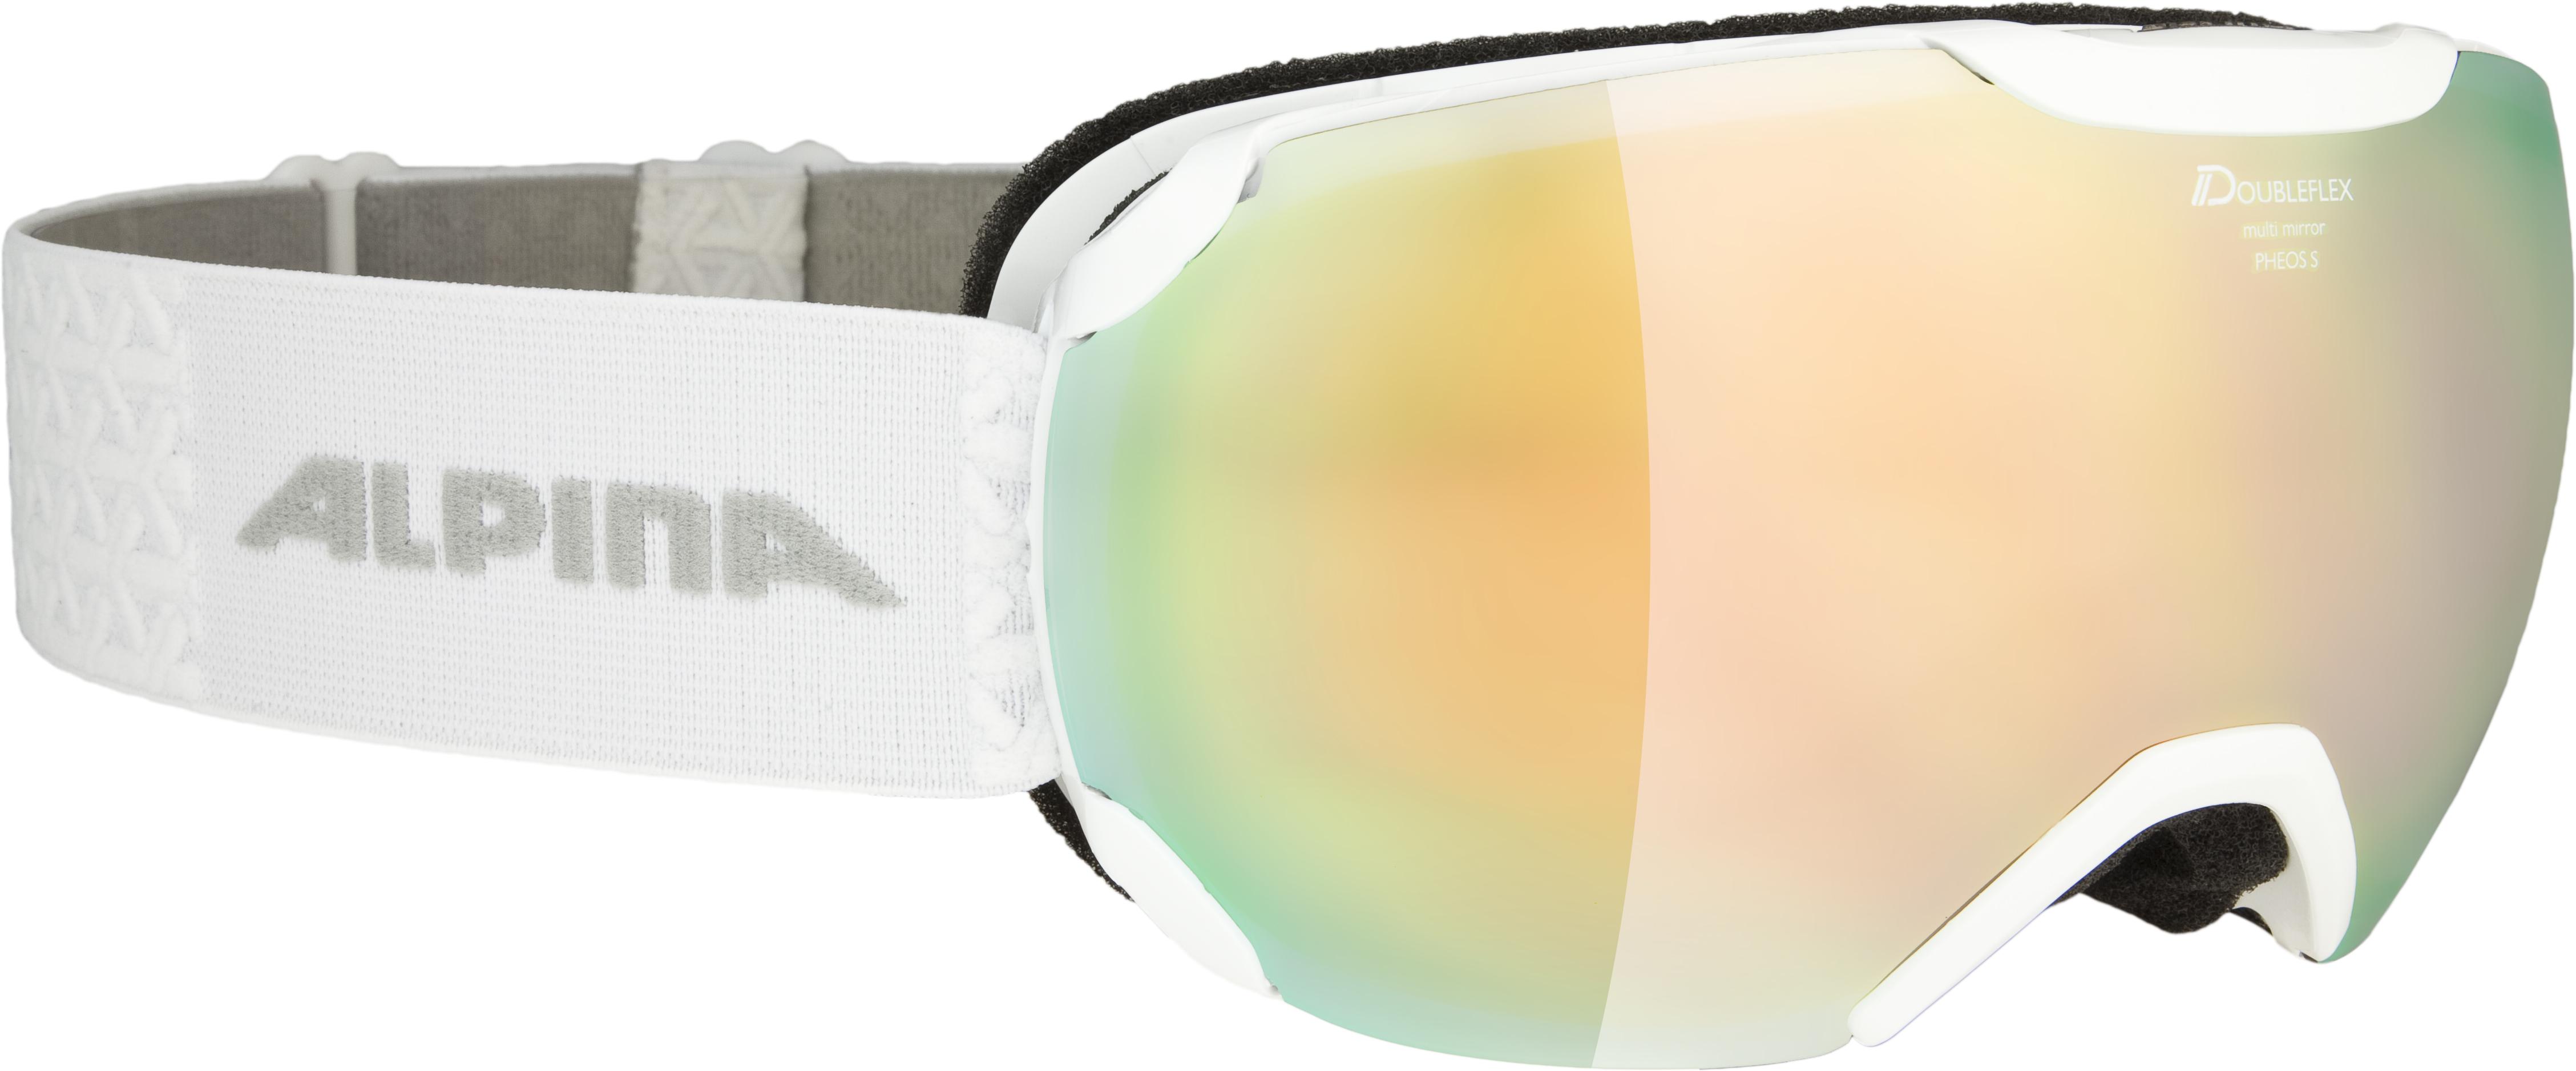 Alpina PHEOS S HM, smučarska očala, bela